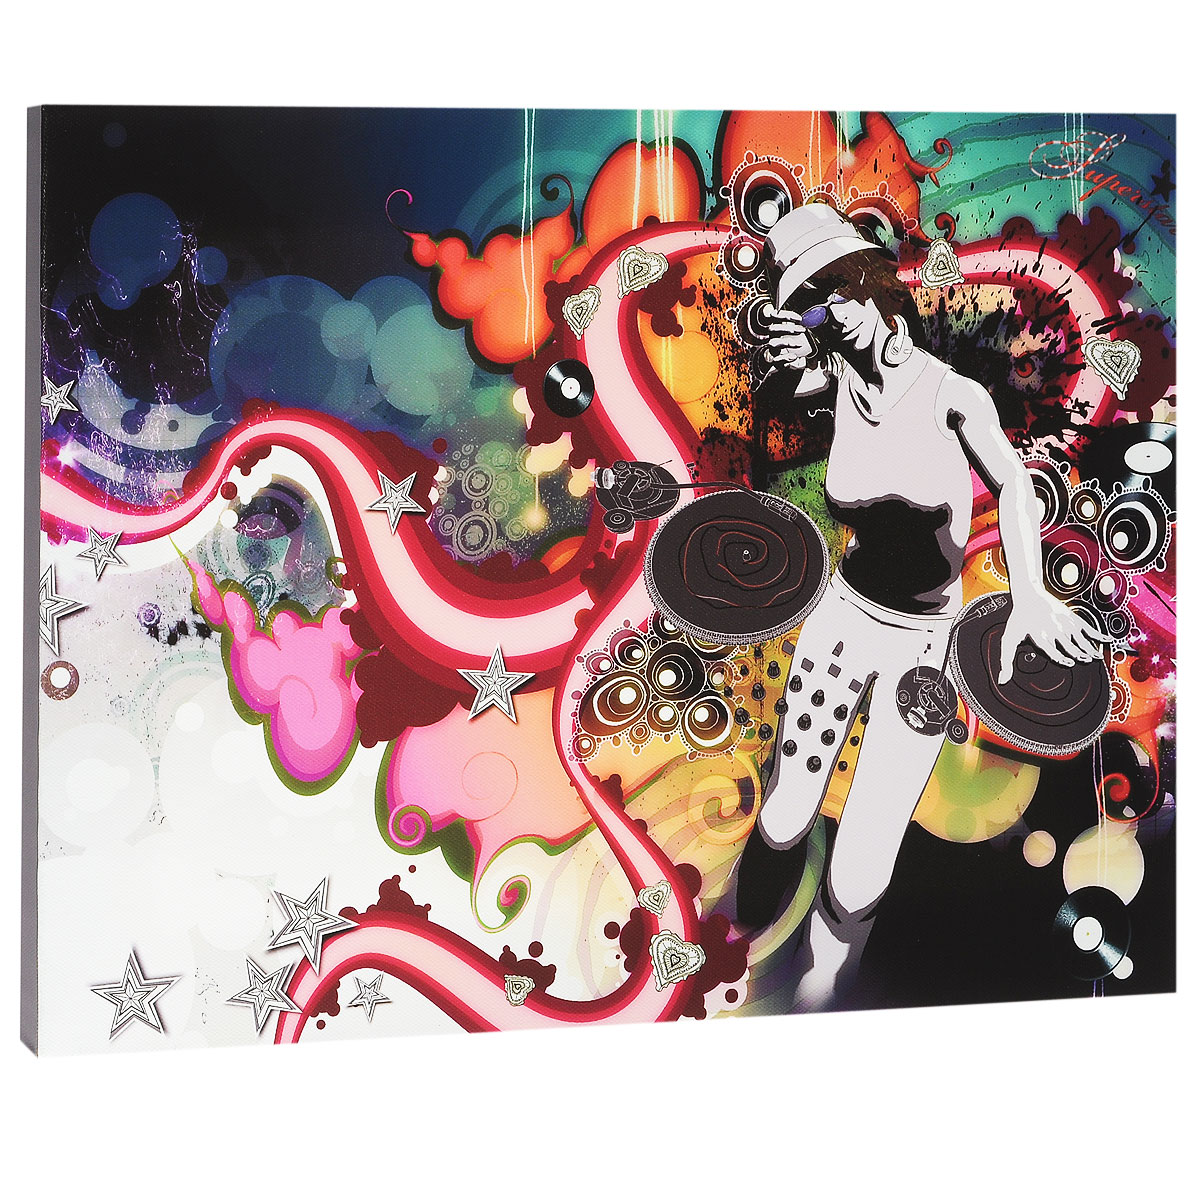 КвикДекор Картина на холсте  Диджей , 40 см х 30 см -  Детская комната